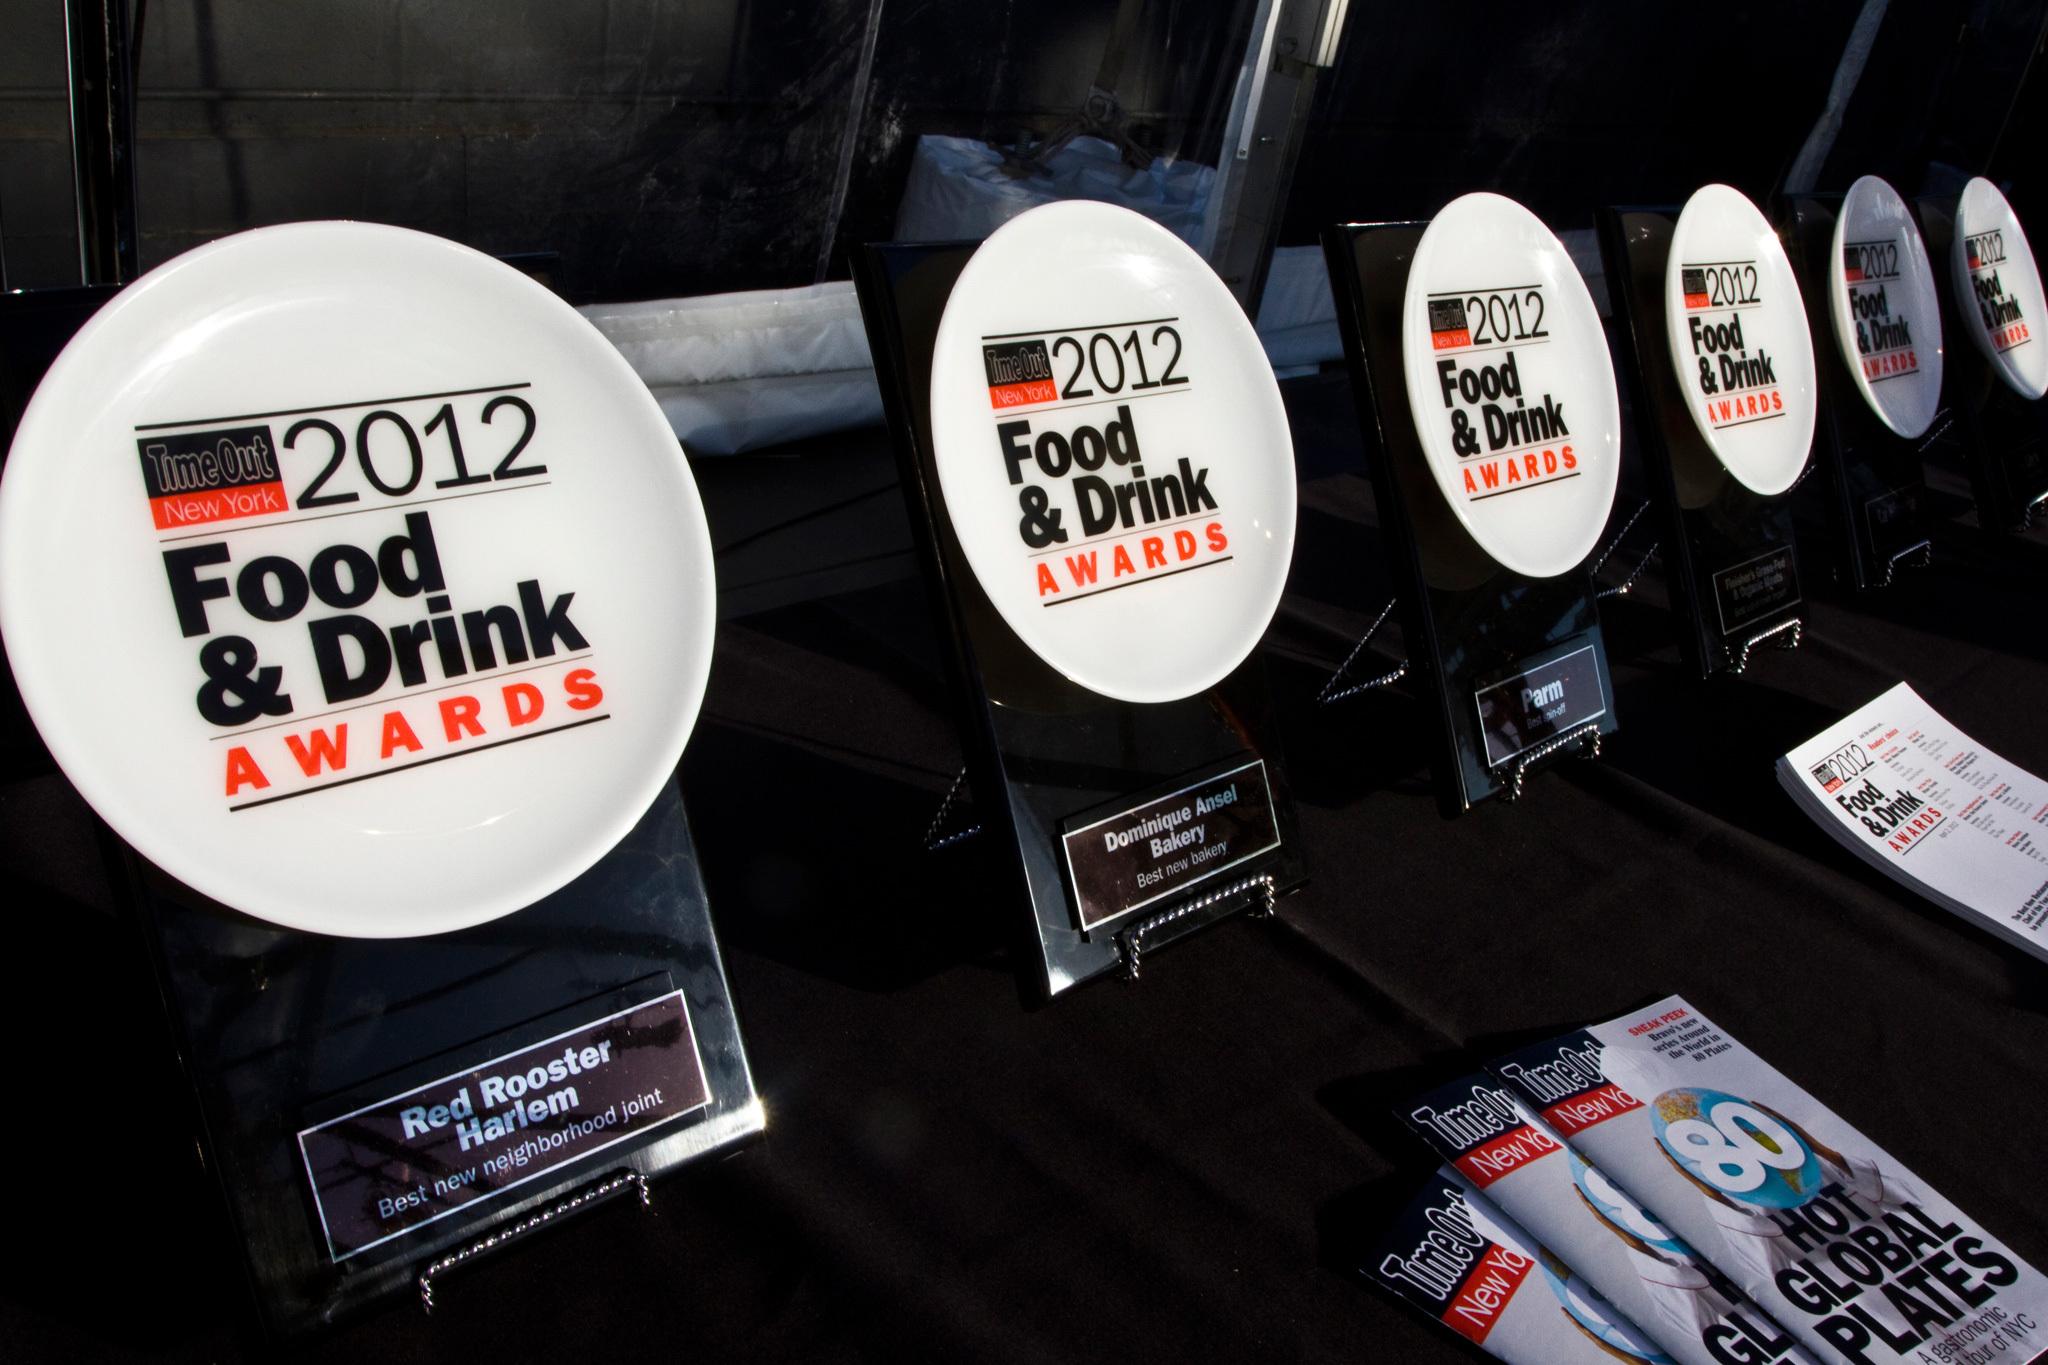 Photos: Food & Drink Awards Ceremony 2012